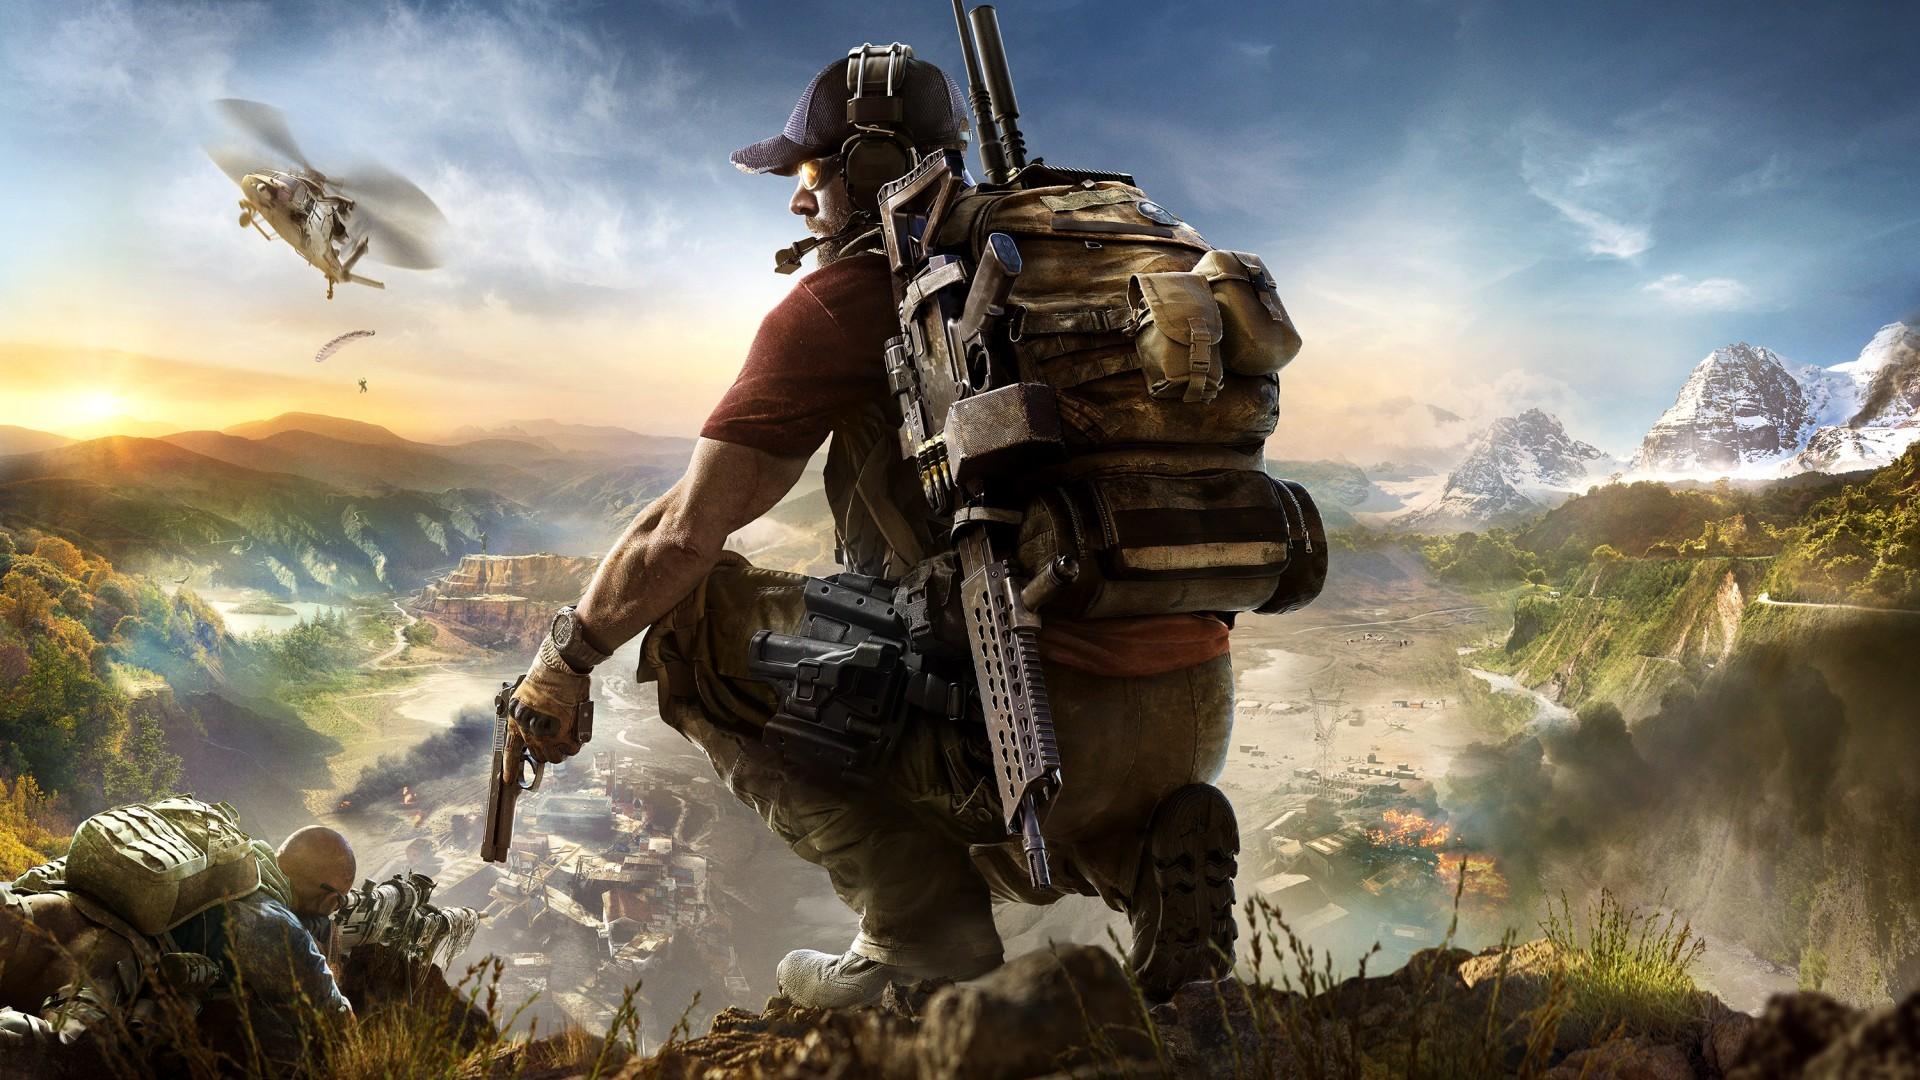 Wallpaper 2017 Games, HD, Tom Clancy's, Ghost Recon Wildlands, Games, #1333